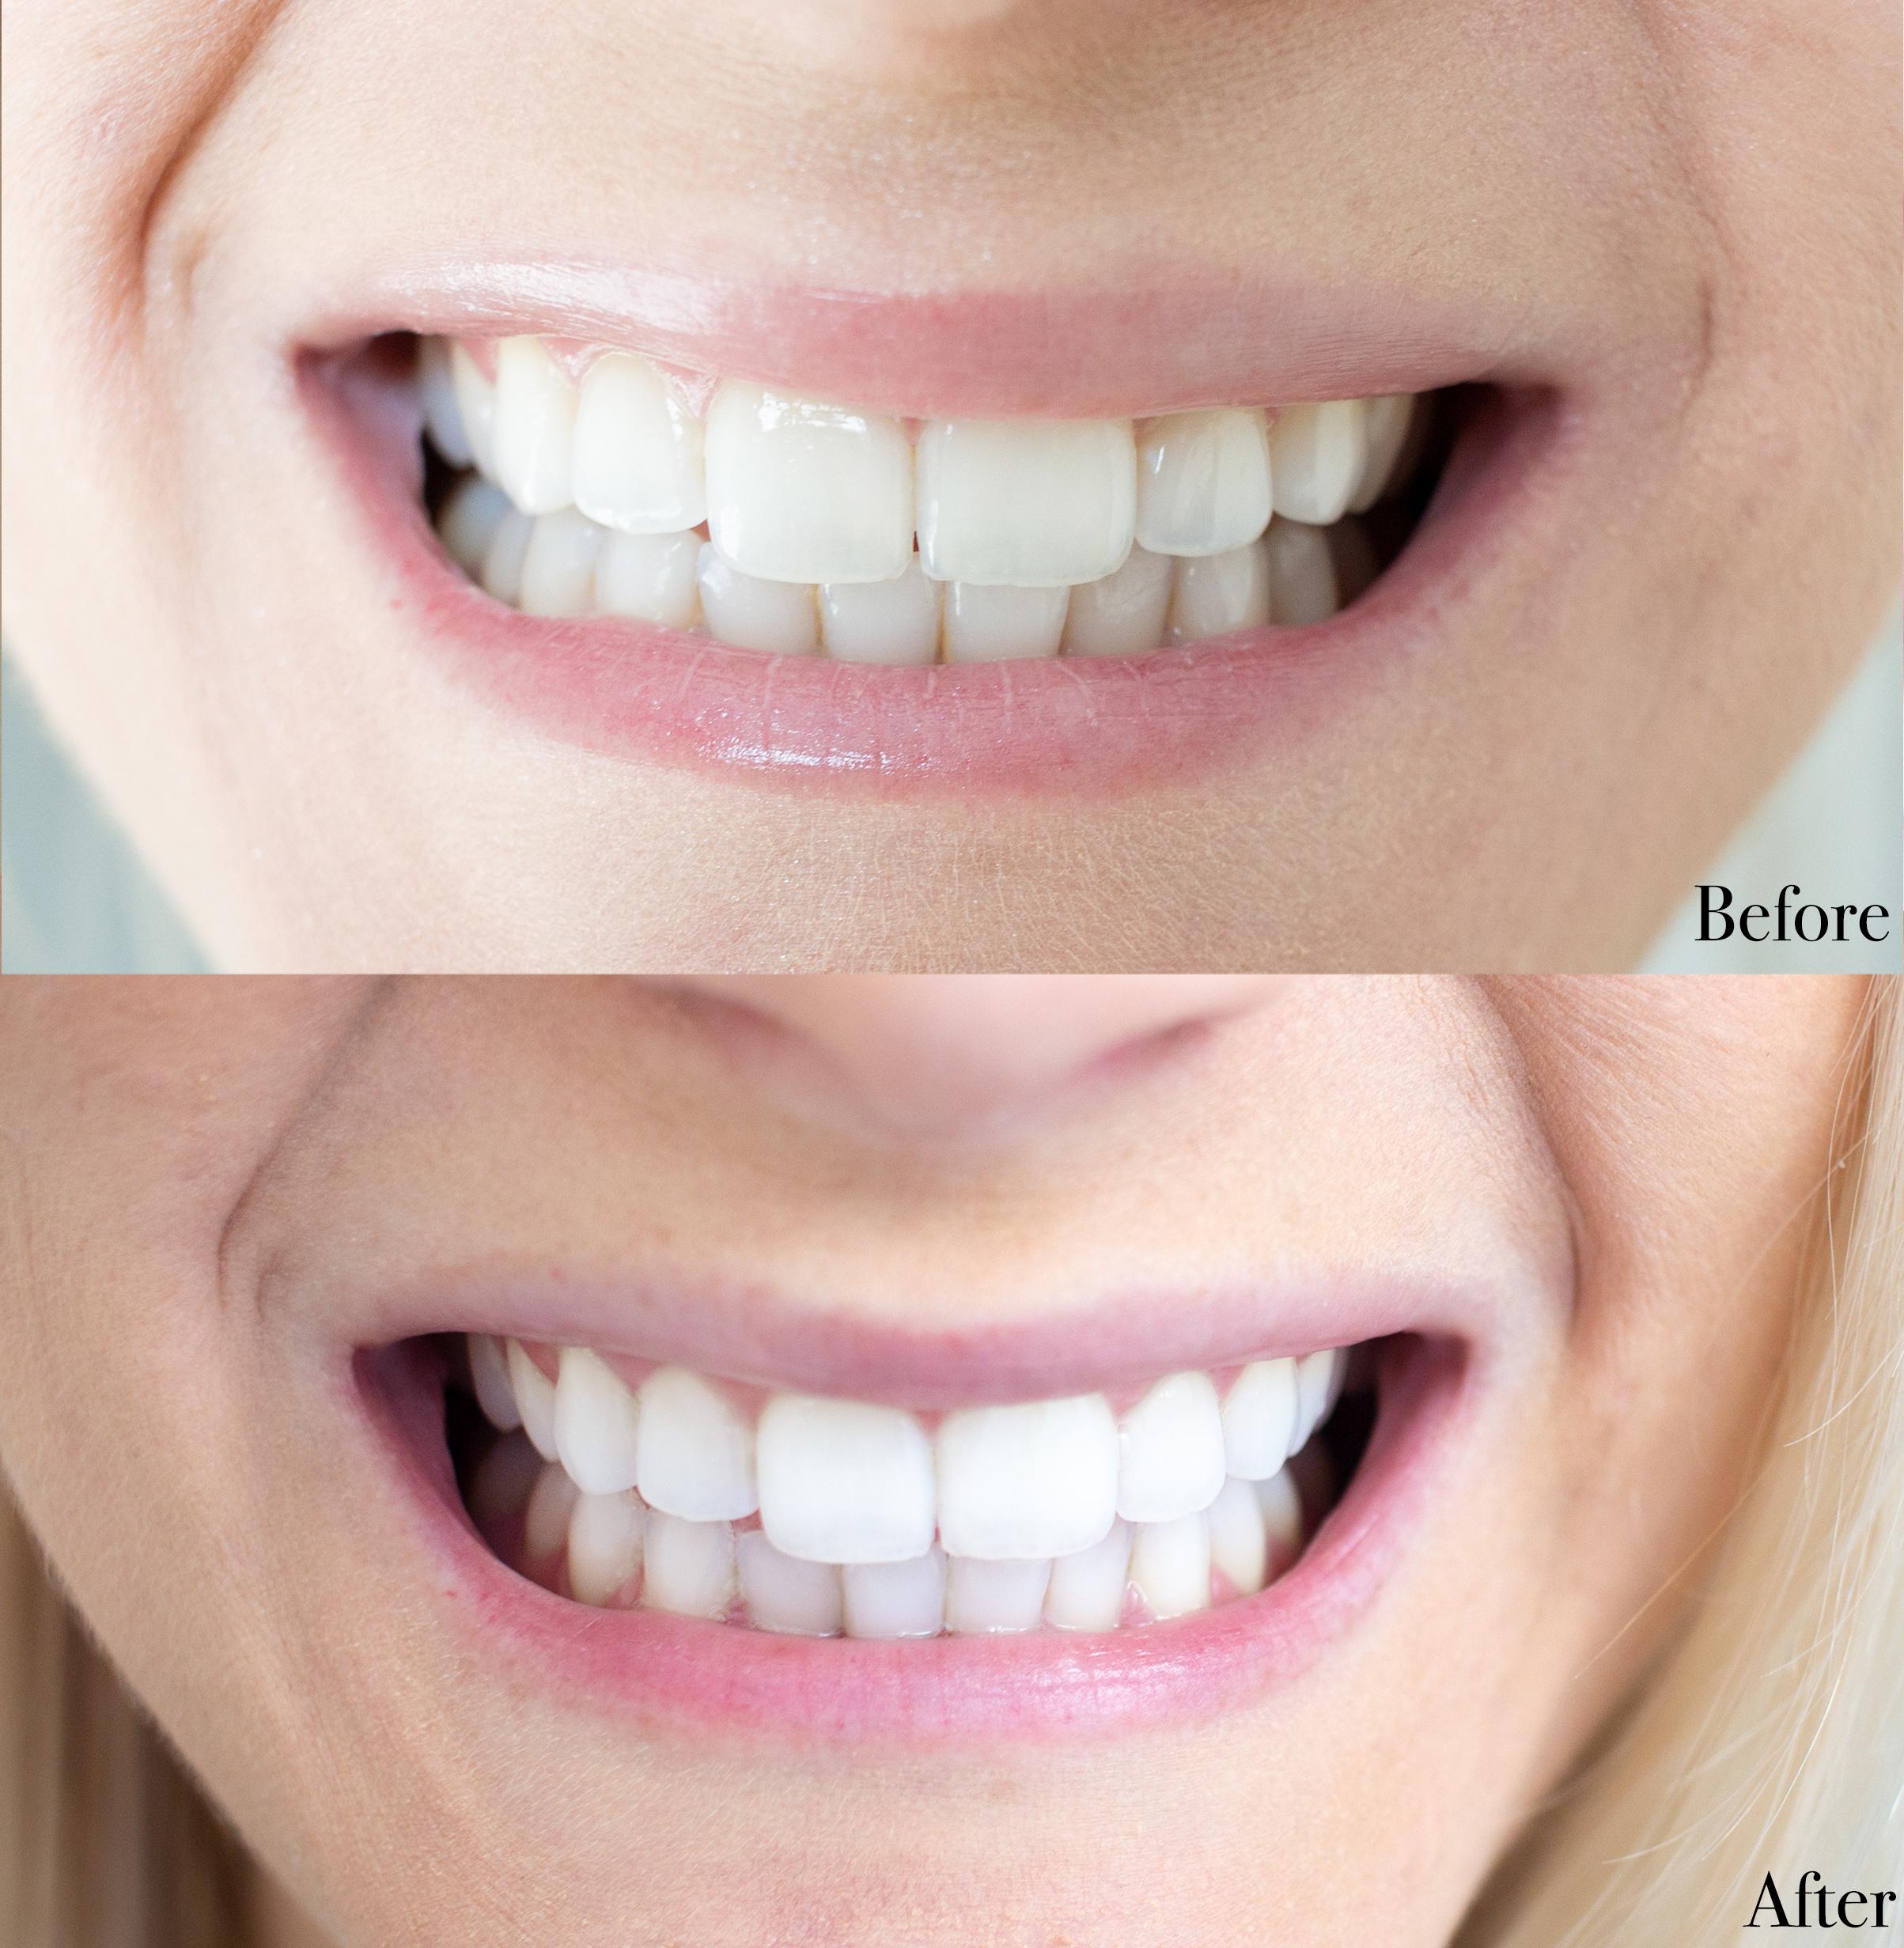 At Home Teeth Whitening For Sensitive Teeth Jenna Danielle